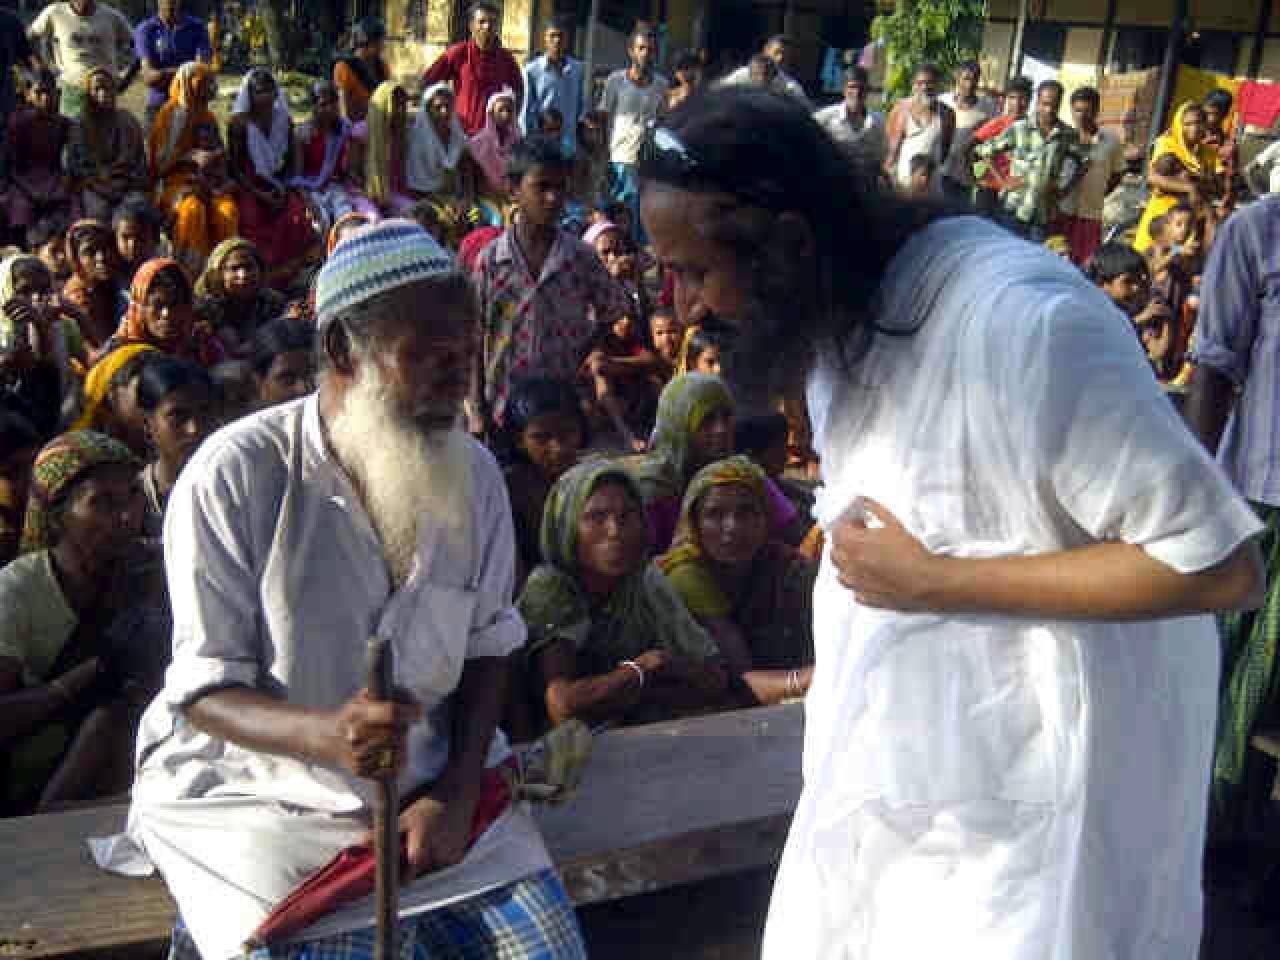 Sri Sri Ravi Shankar visiting the Basugaon camp for Muslim refugees during the Bodo-Muslim riots in 2012.